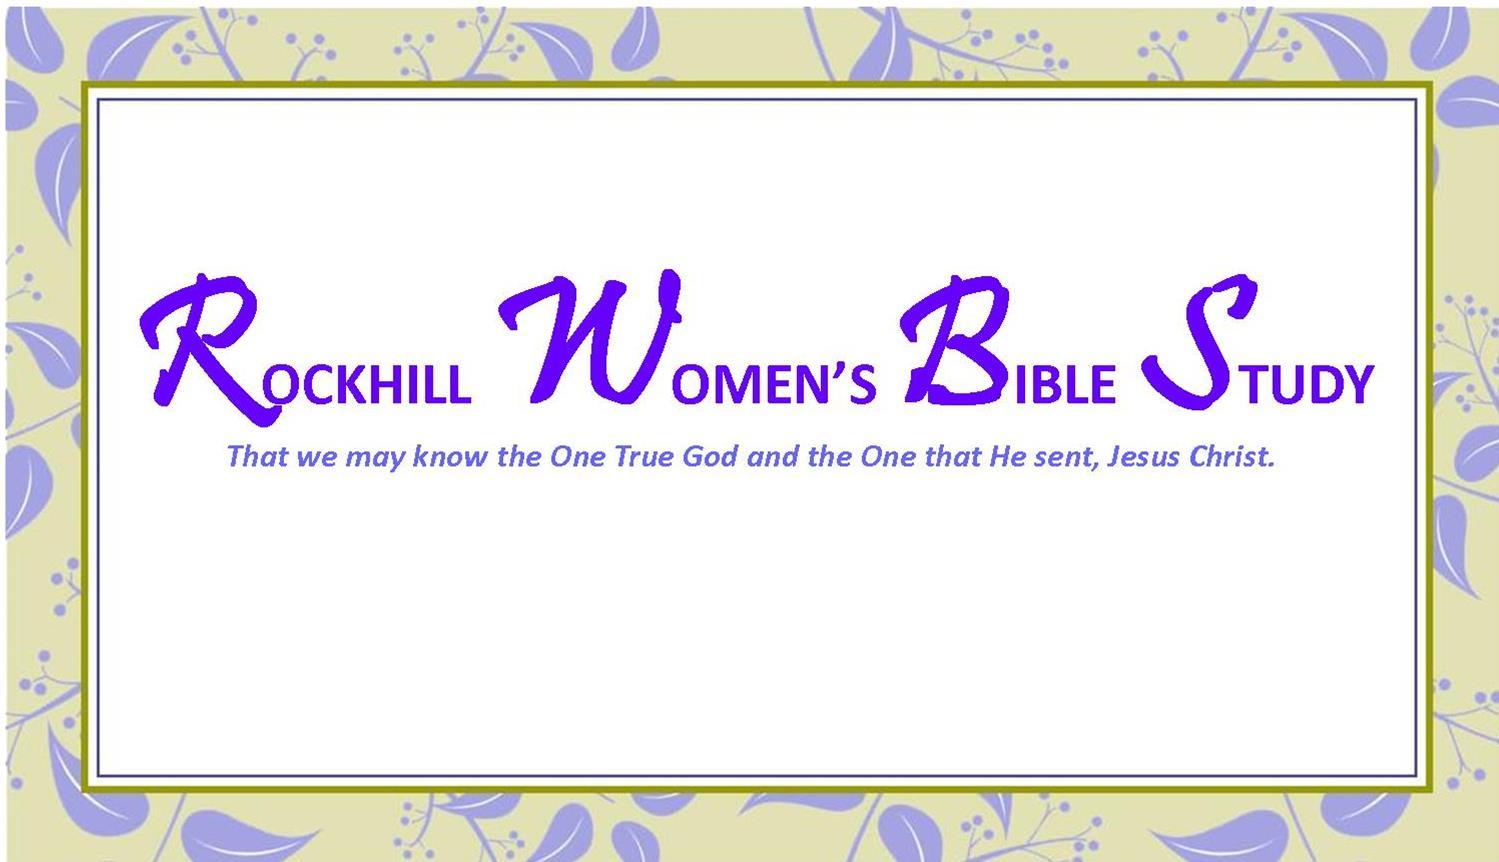 Rockhill Women's Bible Study